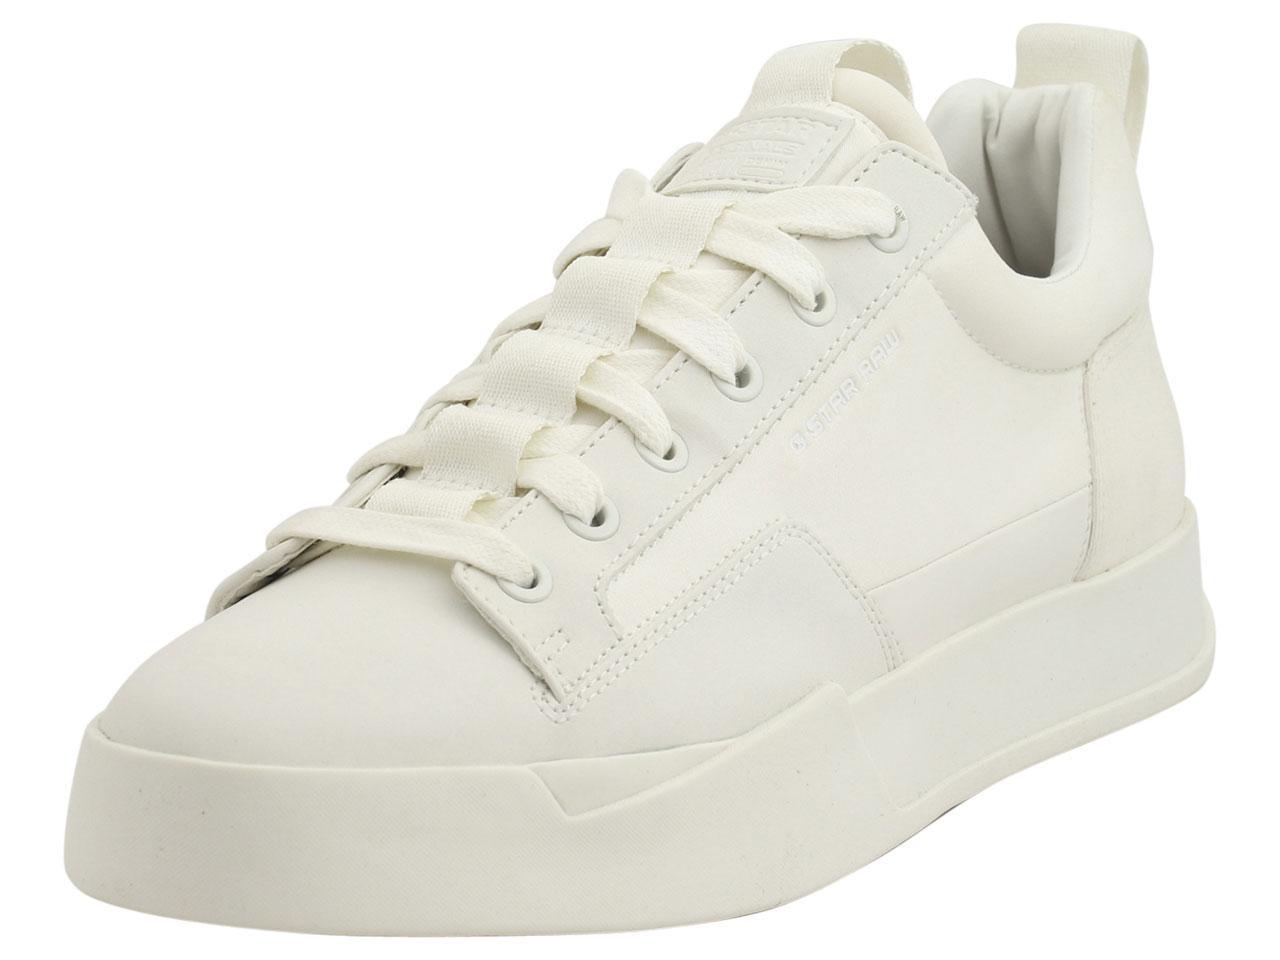 G-Star Raw Men's Rackam Core Sneakers Shoes